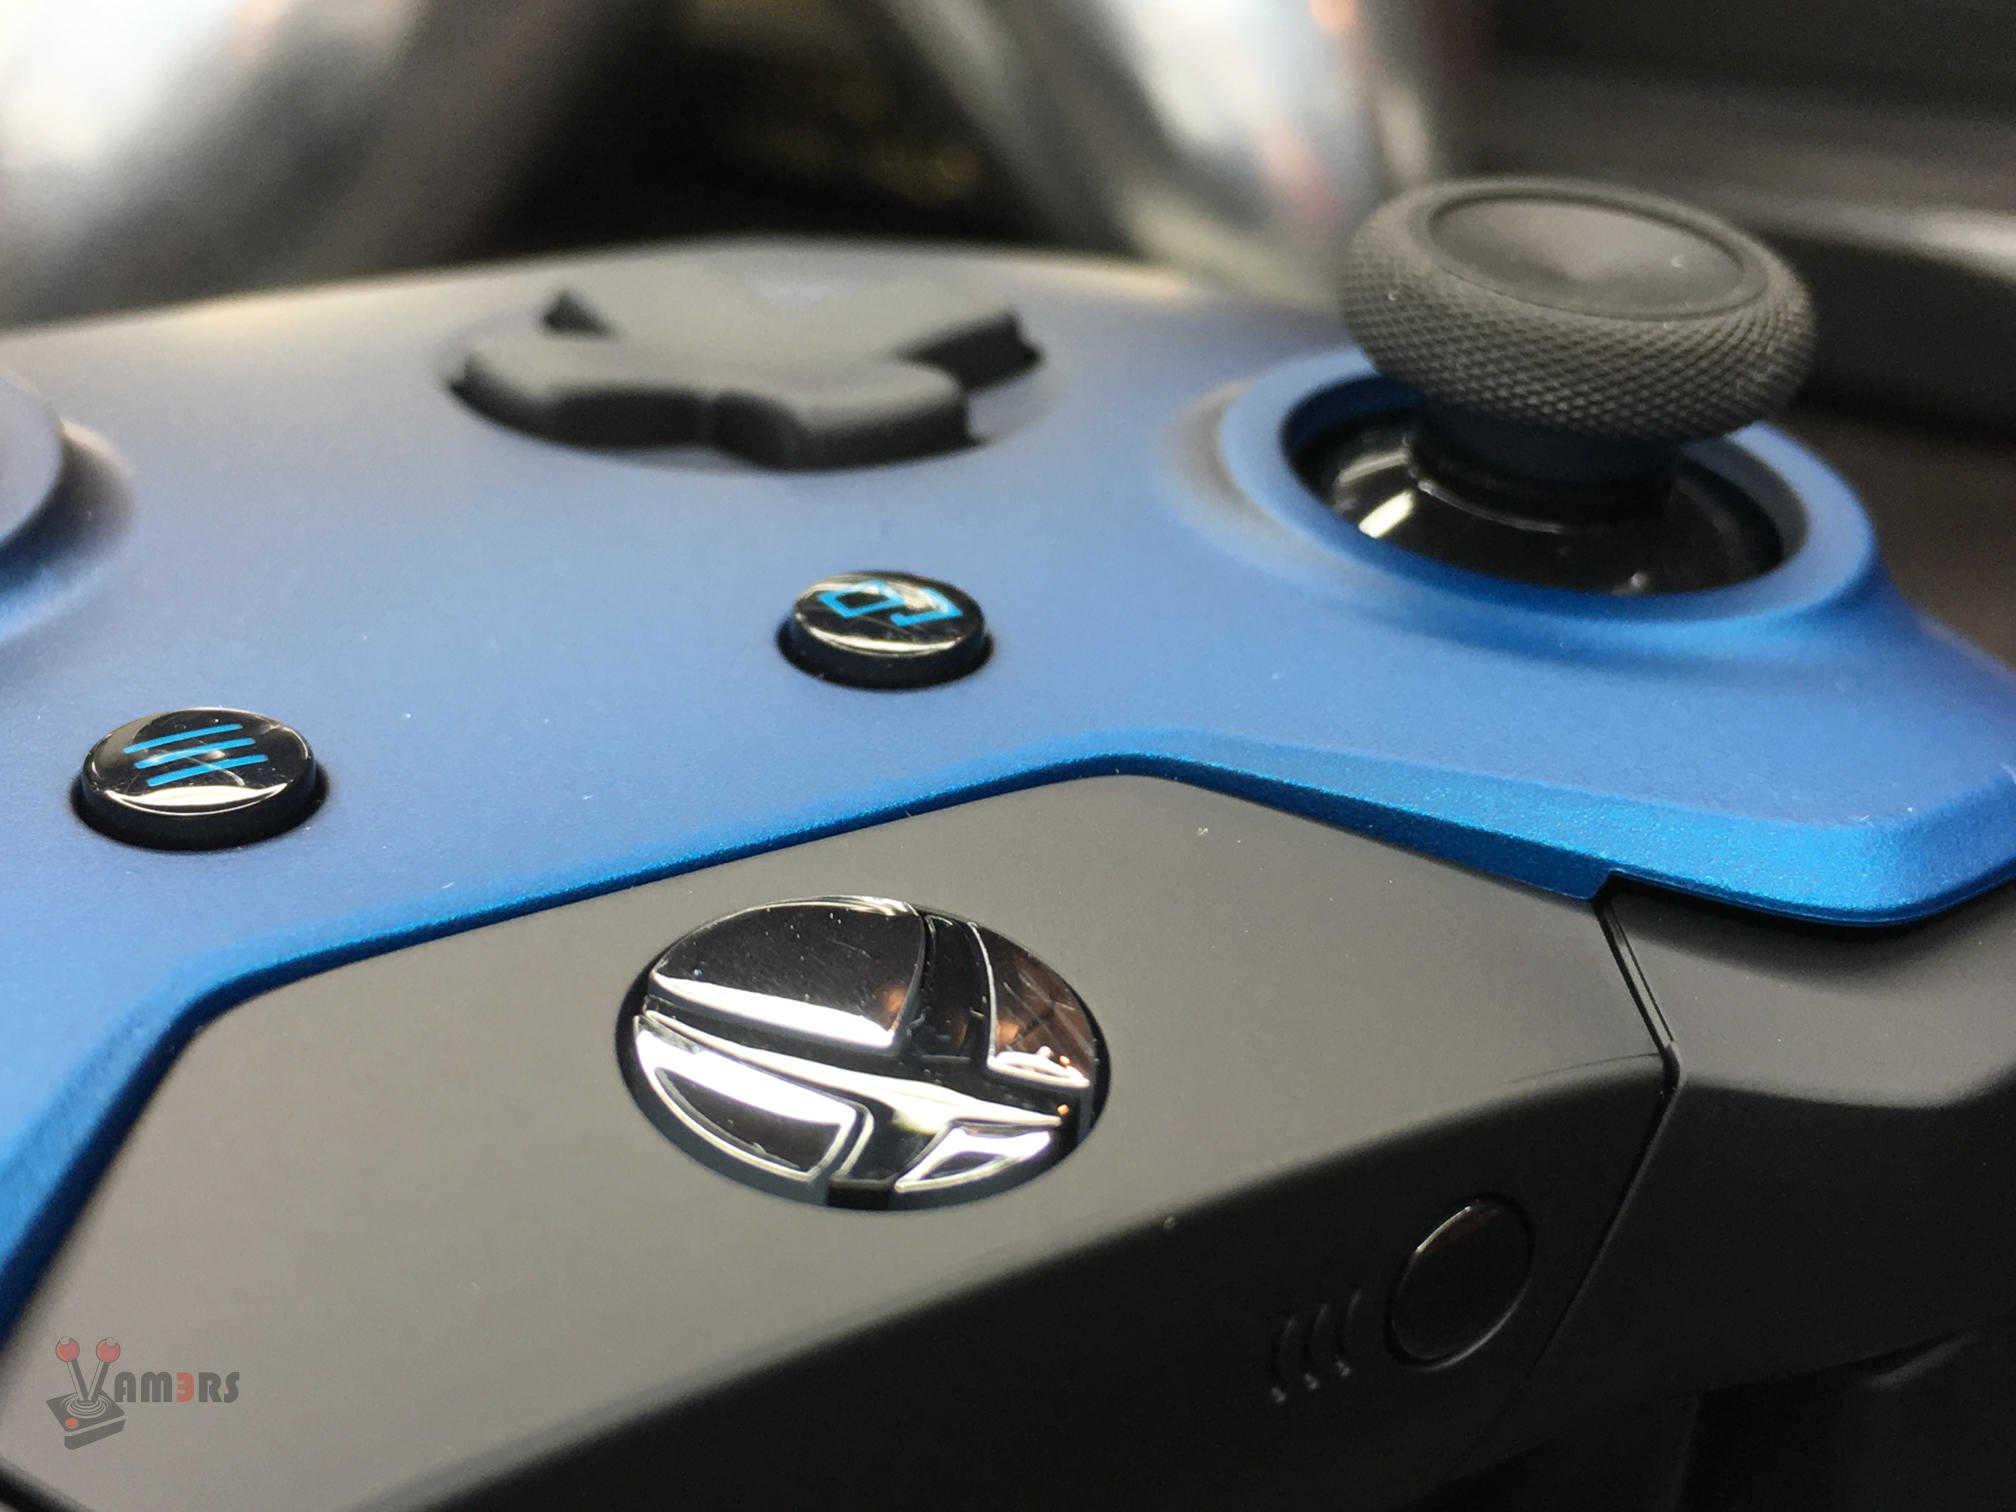 Xbox One Dusk Shadow Controller Celebrates Nightfall